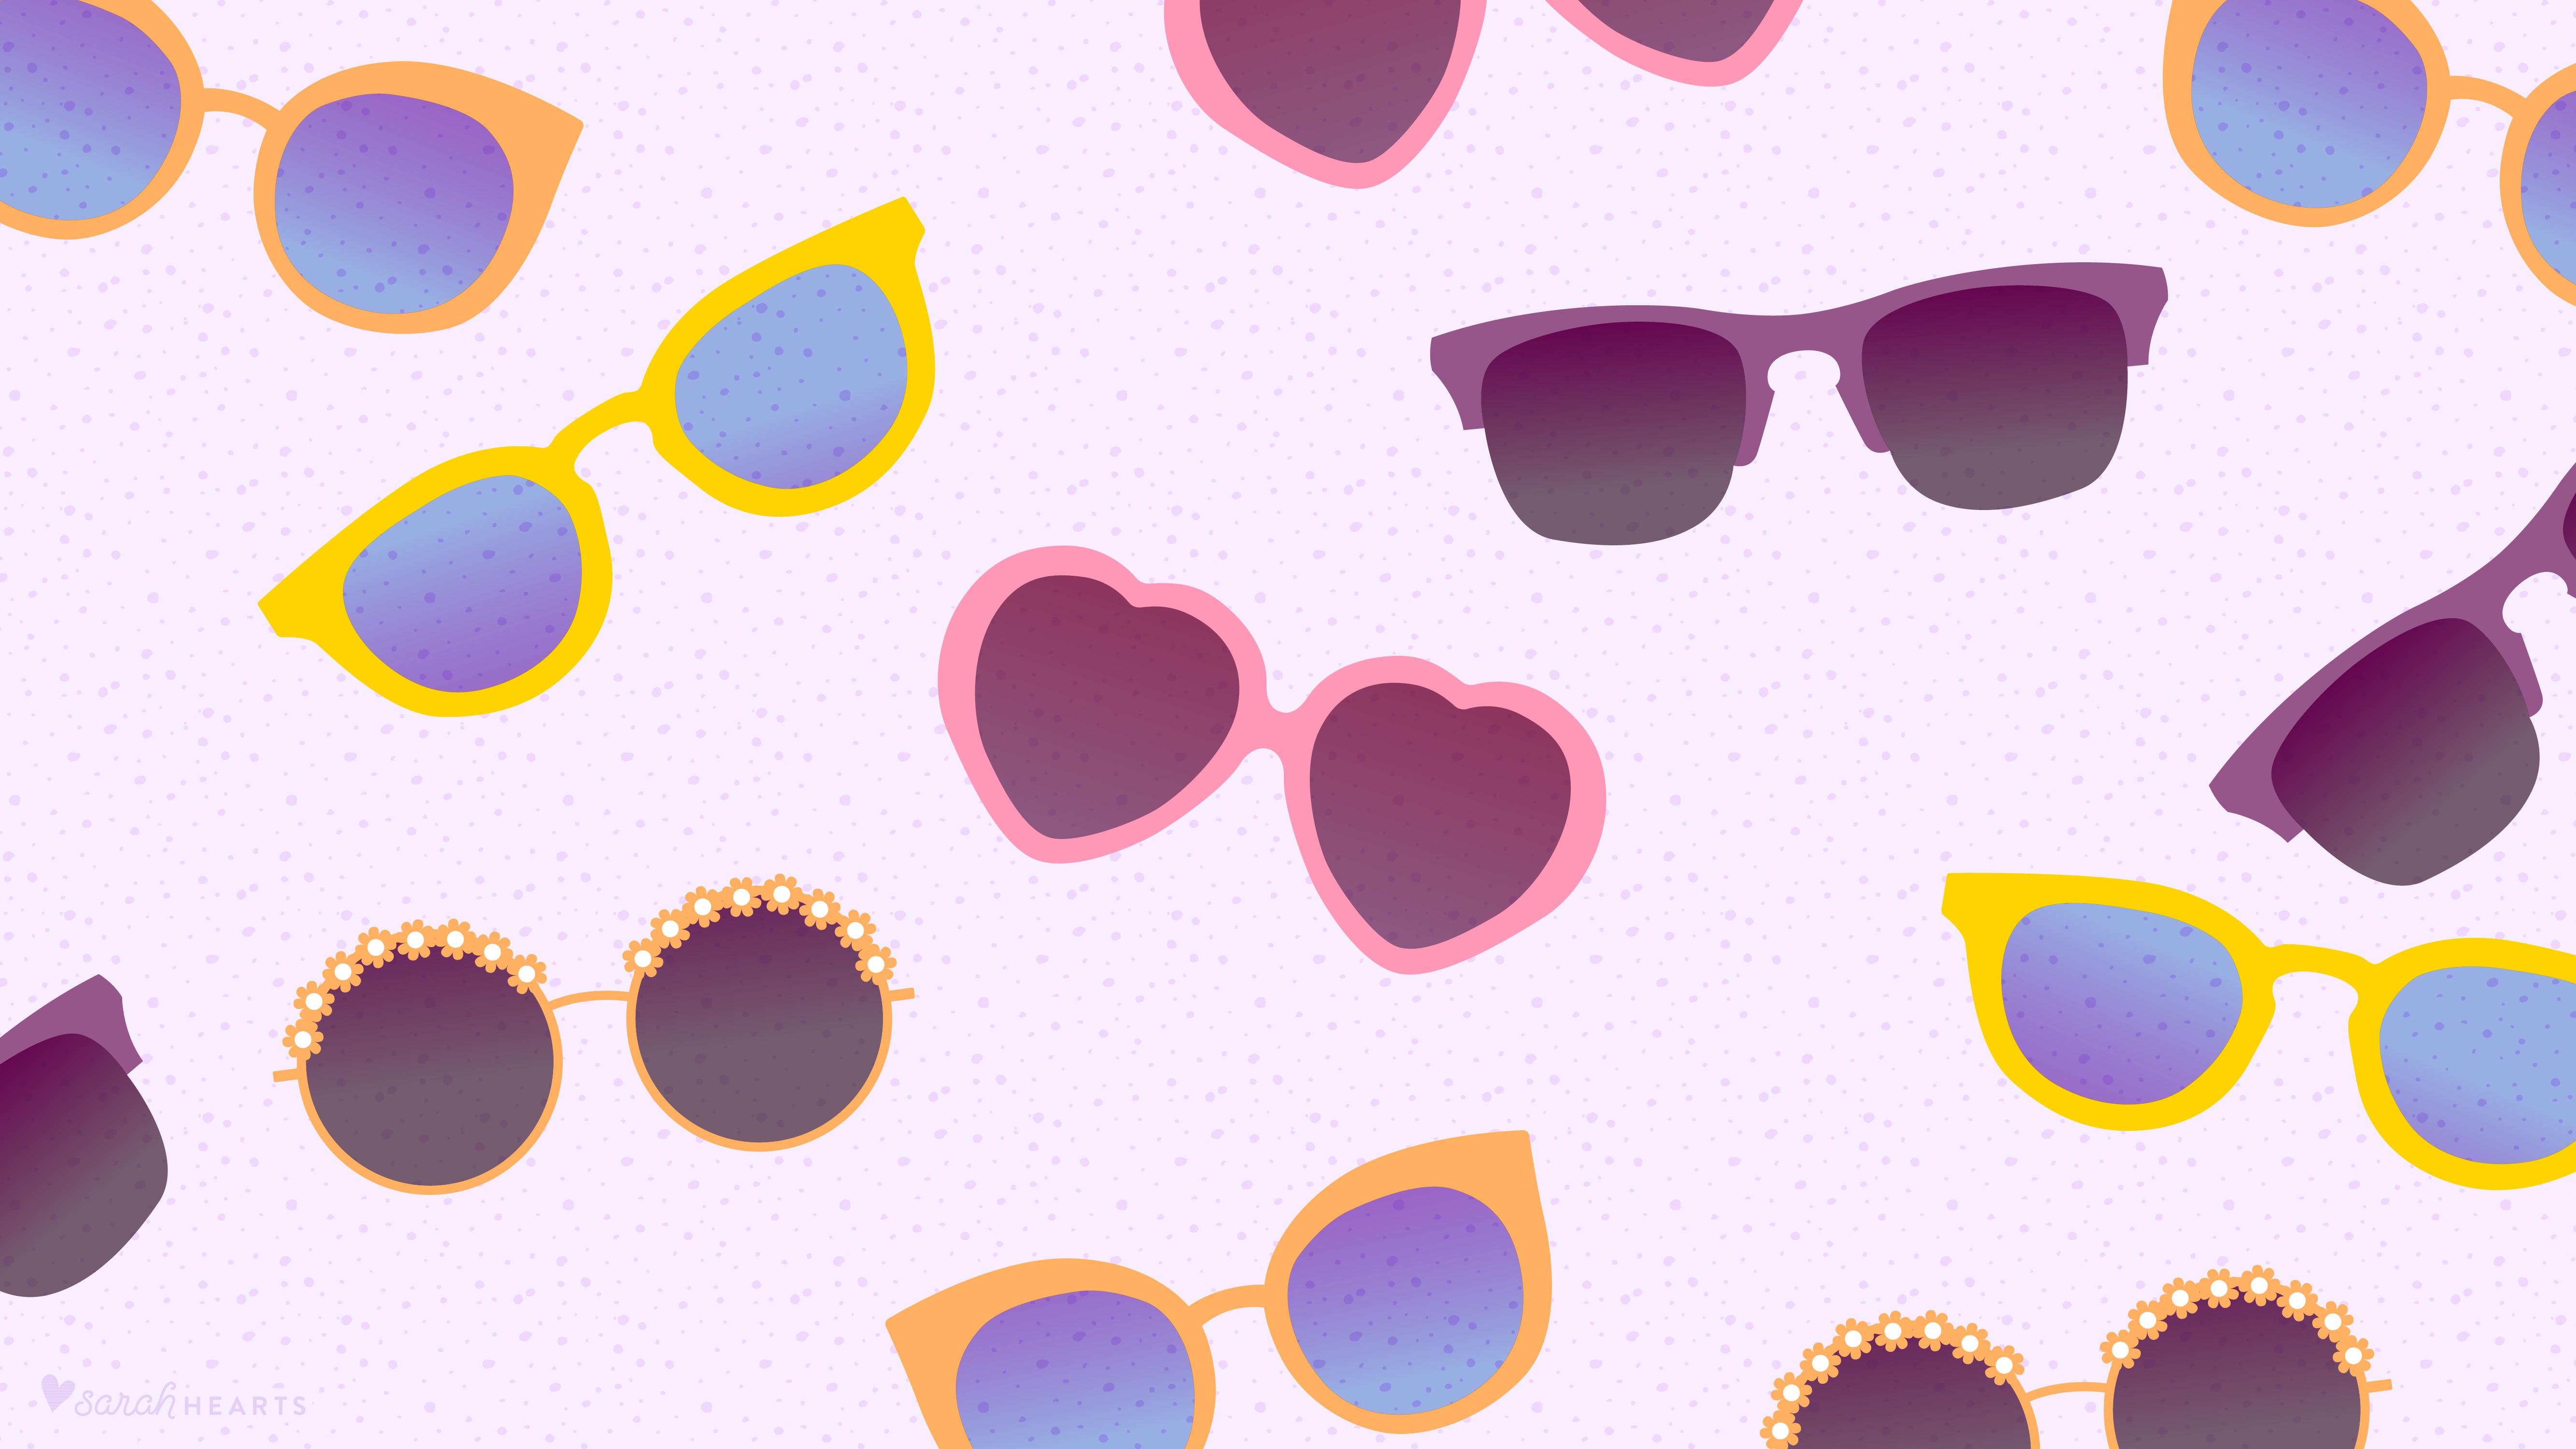 june 2016 sunglasses calendar wallpaper